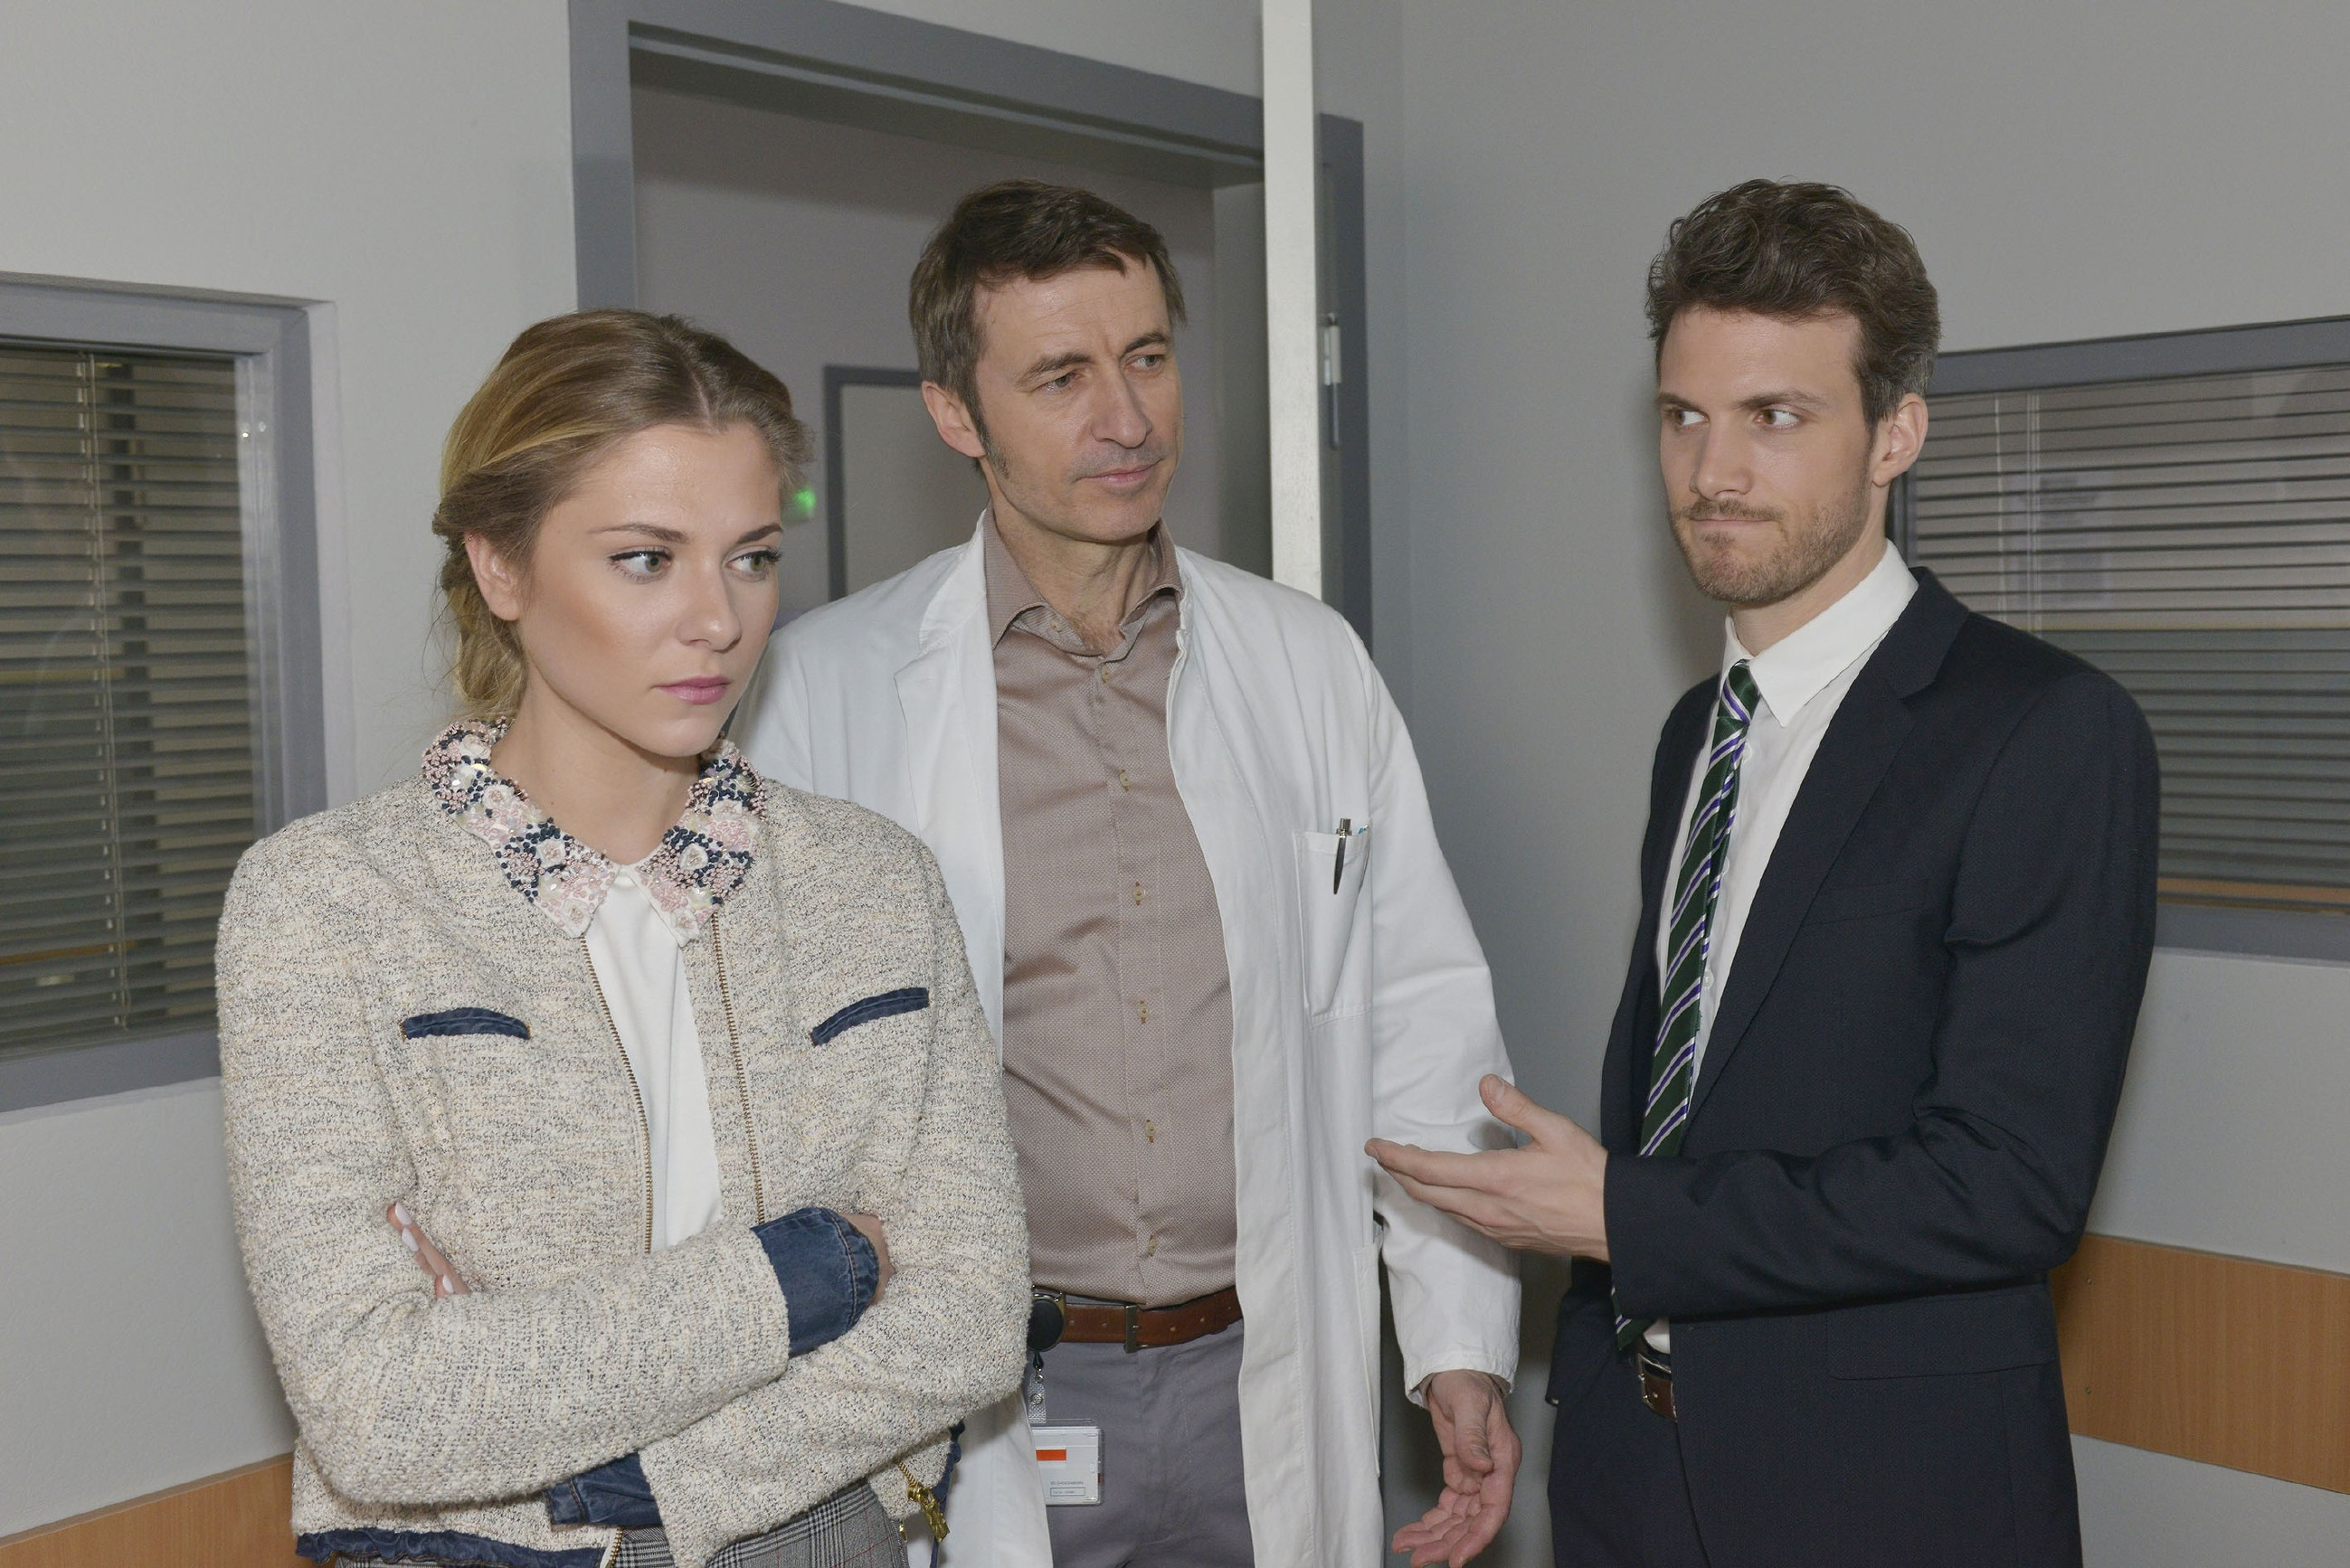 Felix (Thaddäus Meilinger, r.) muss Sunny (Valentina Pahde) notgedrungen allein zu Chris lassen (M. Guido Broscheit als Dr. Martin Wolf). (Quelle: RTL / Rolf Baumgartner)